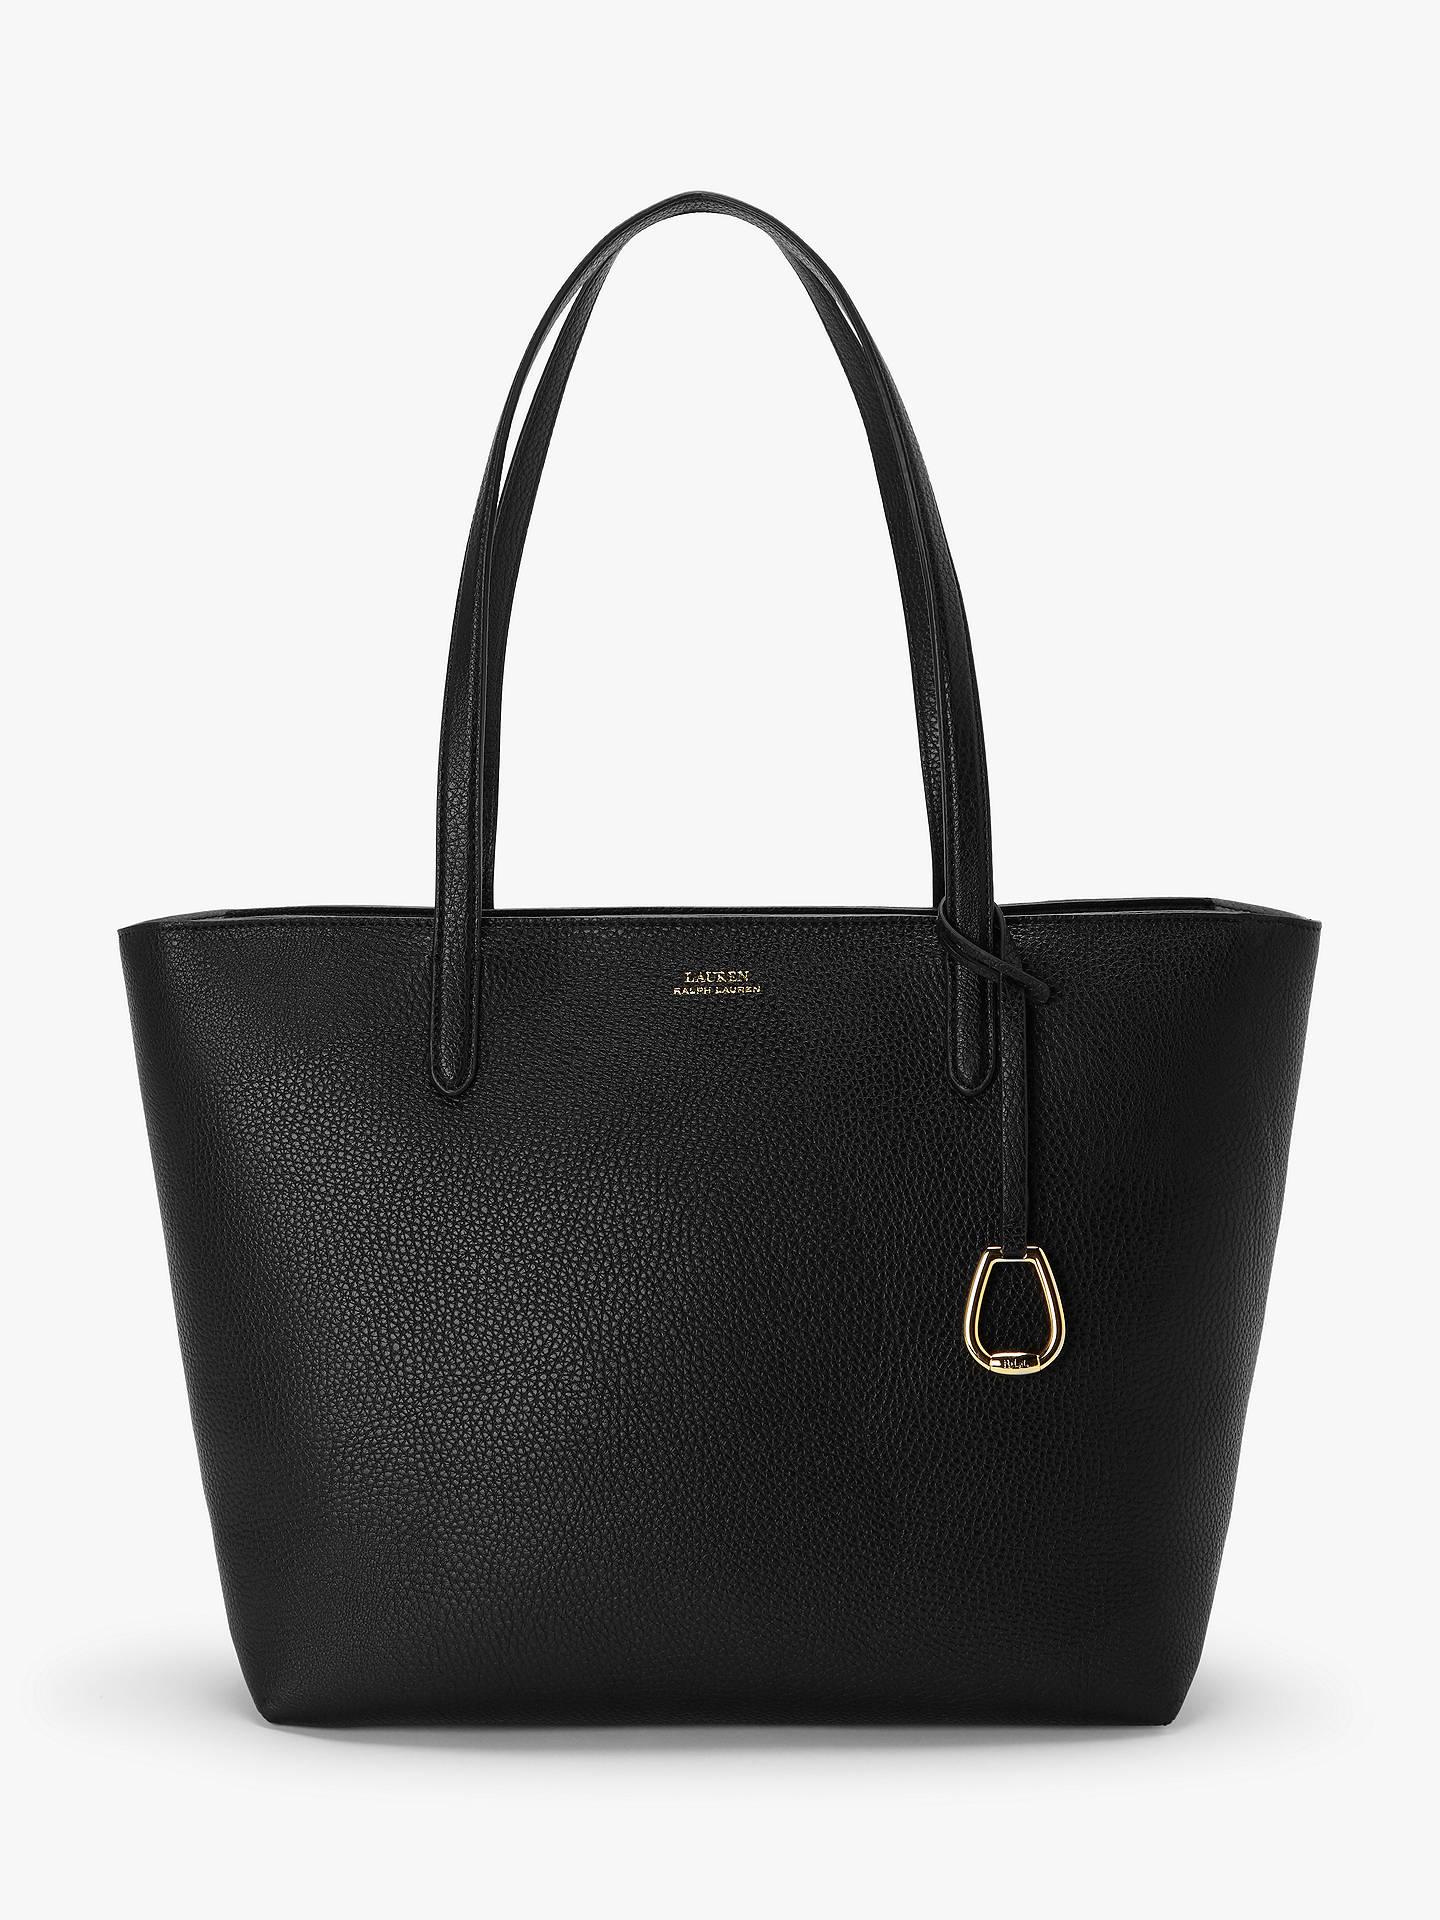 ae696c06e1 Buy Lauren Ralph Lauren Medium Tote Bag